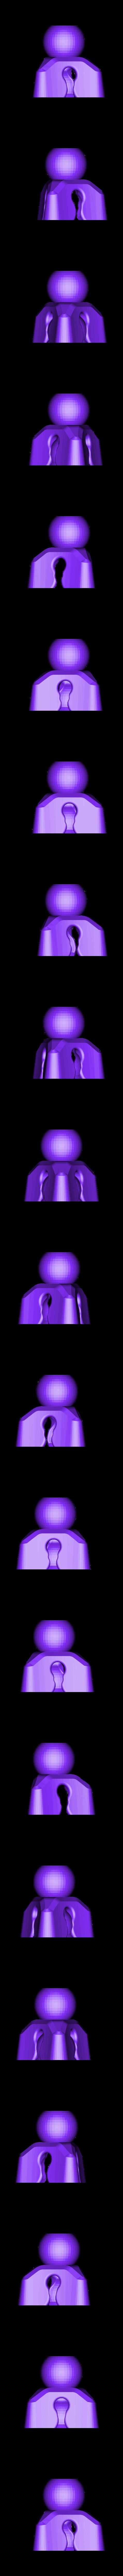 segment.stl Download free STL file Guardian Robot Hackable – Bottom Remix • 3D print object, Adafruit